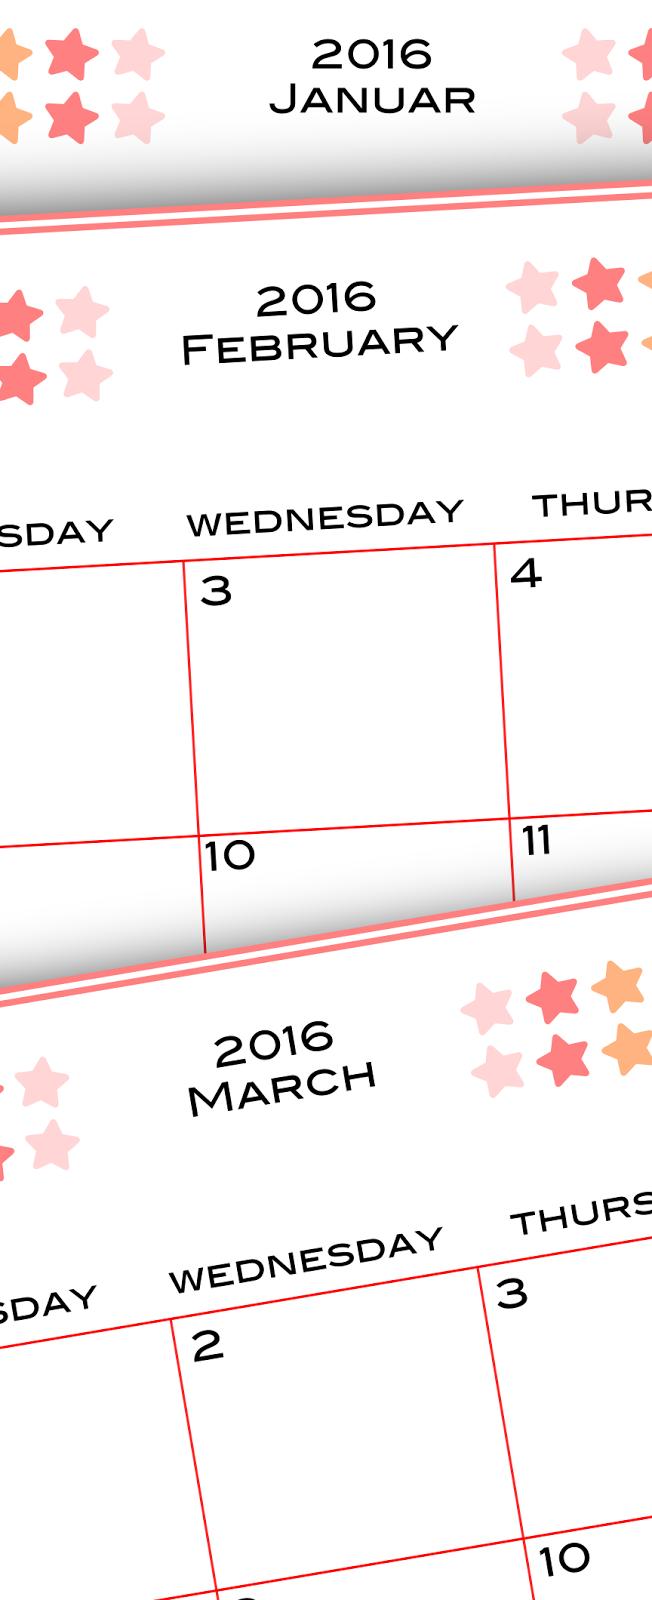 free printable 2016 planner calendar monthly calendar kalender freebie meinlilapark. Black Bedroom Furniture Sets. Home Design Ideas